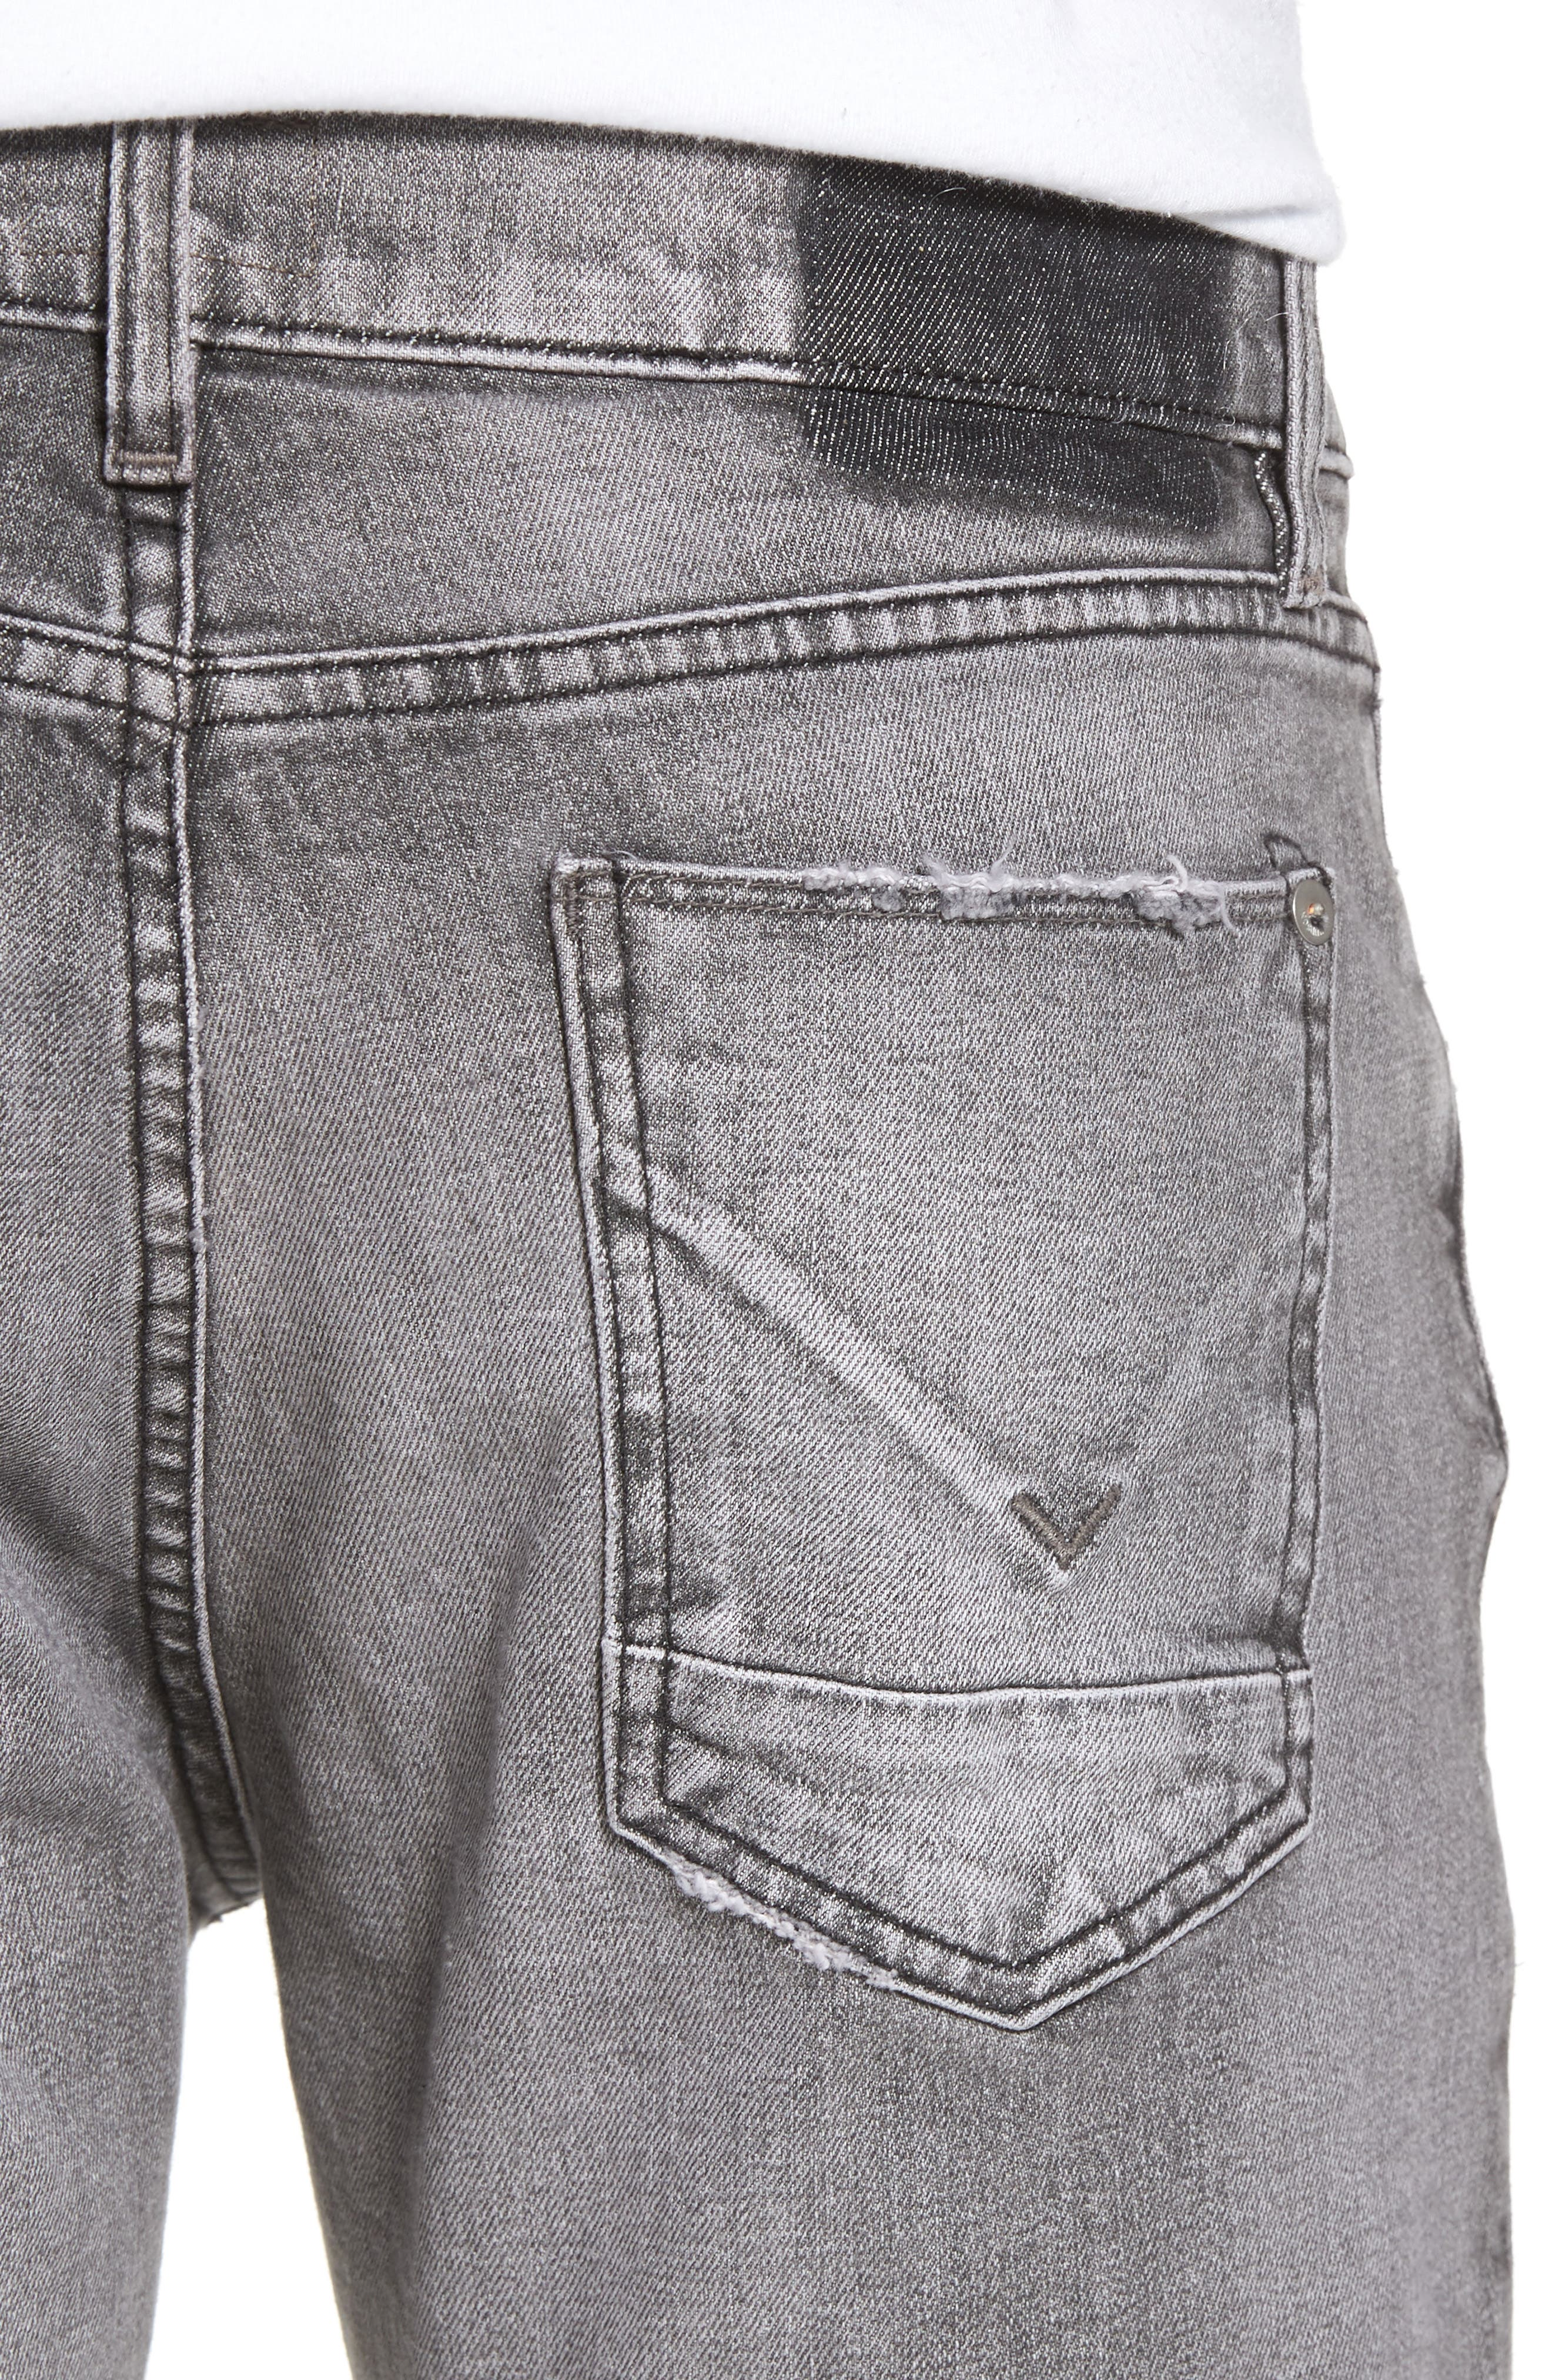 HUDSON JEANS,                             Blake Slim Fit Jeans,                             Alternate thumbnail 4, color,                             063